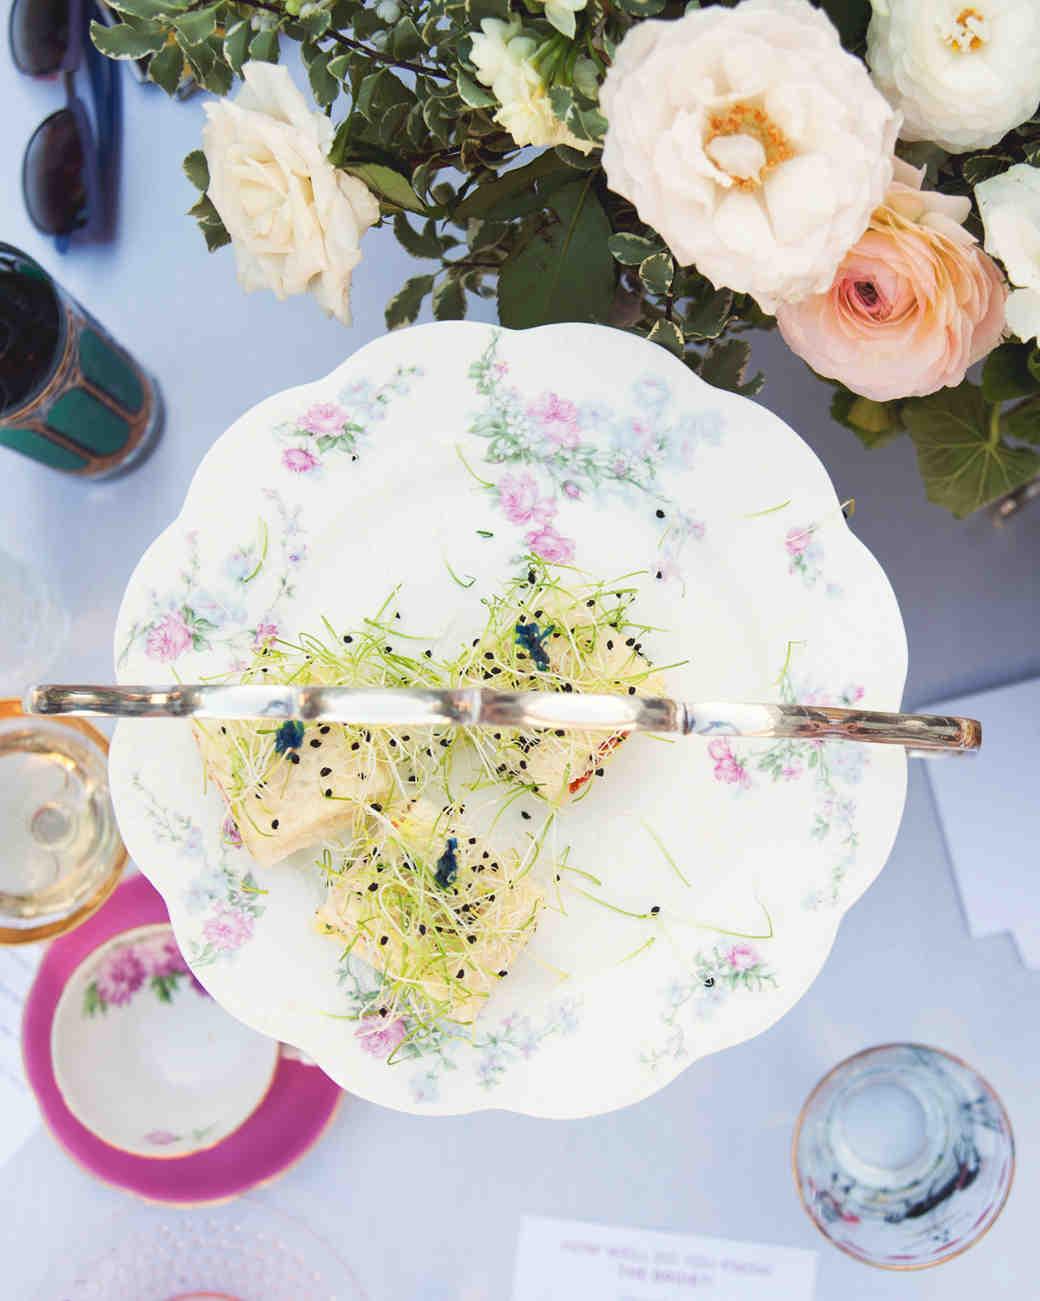 claire-thomas-bridal-shower-table-0215.jpg